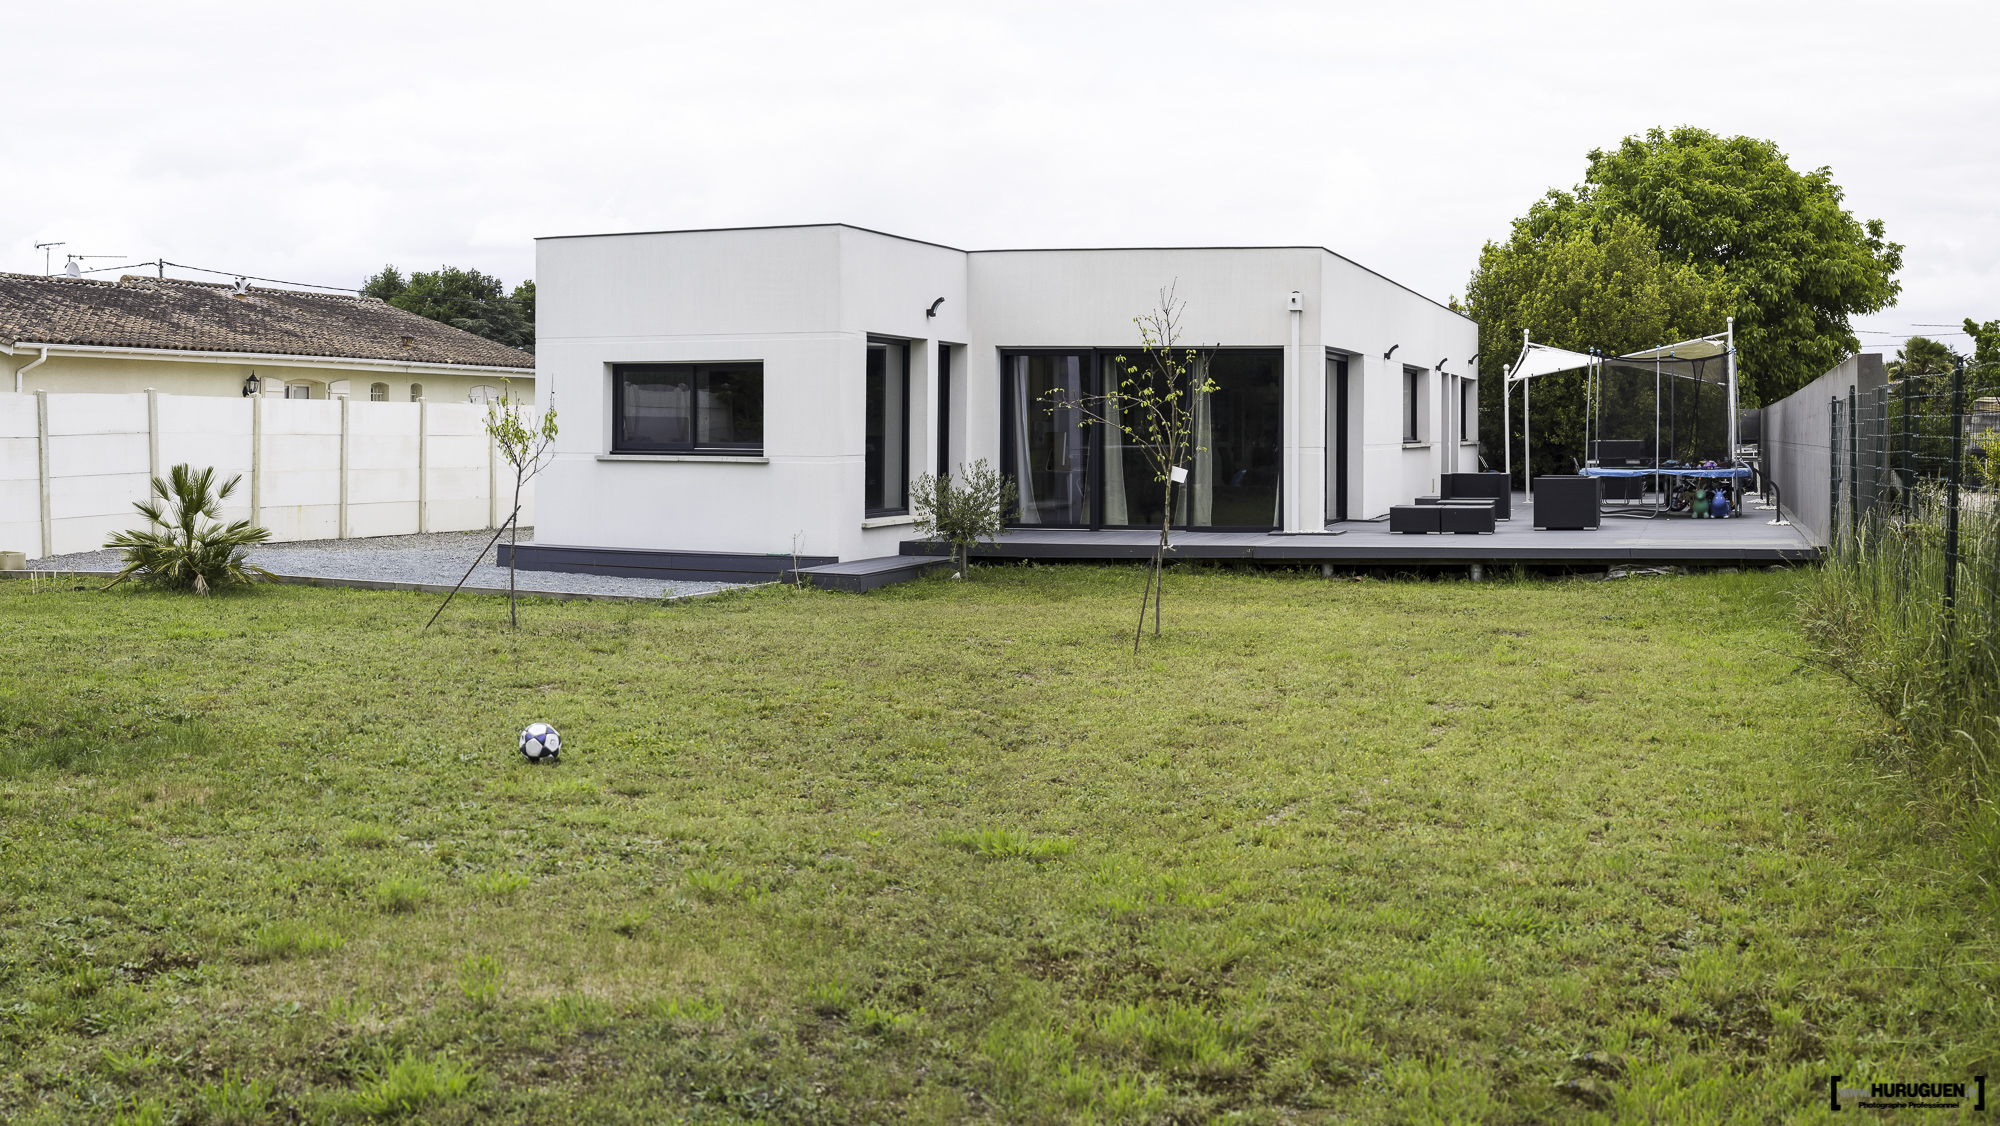 photographe immobilier photographe professionnel bordeaux sebastien huruguen. Black Bedroom Furniture Sets. Home Design Ideas